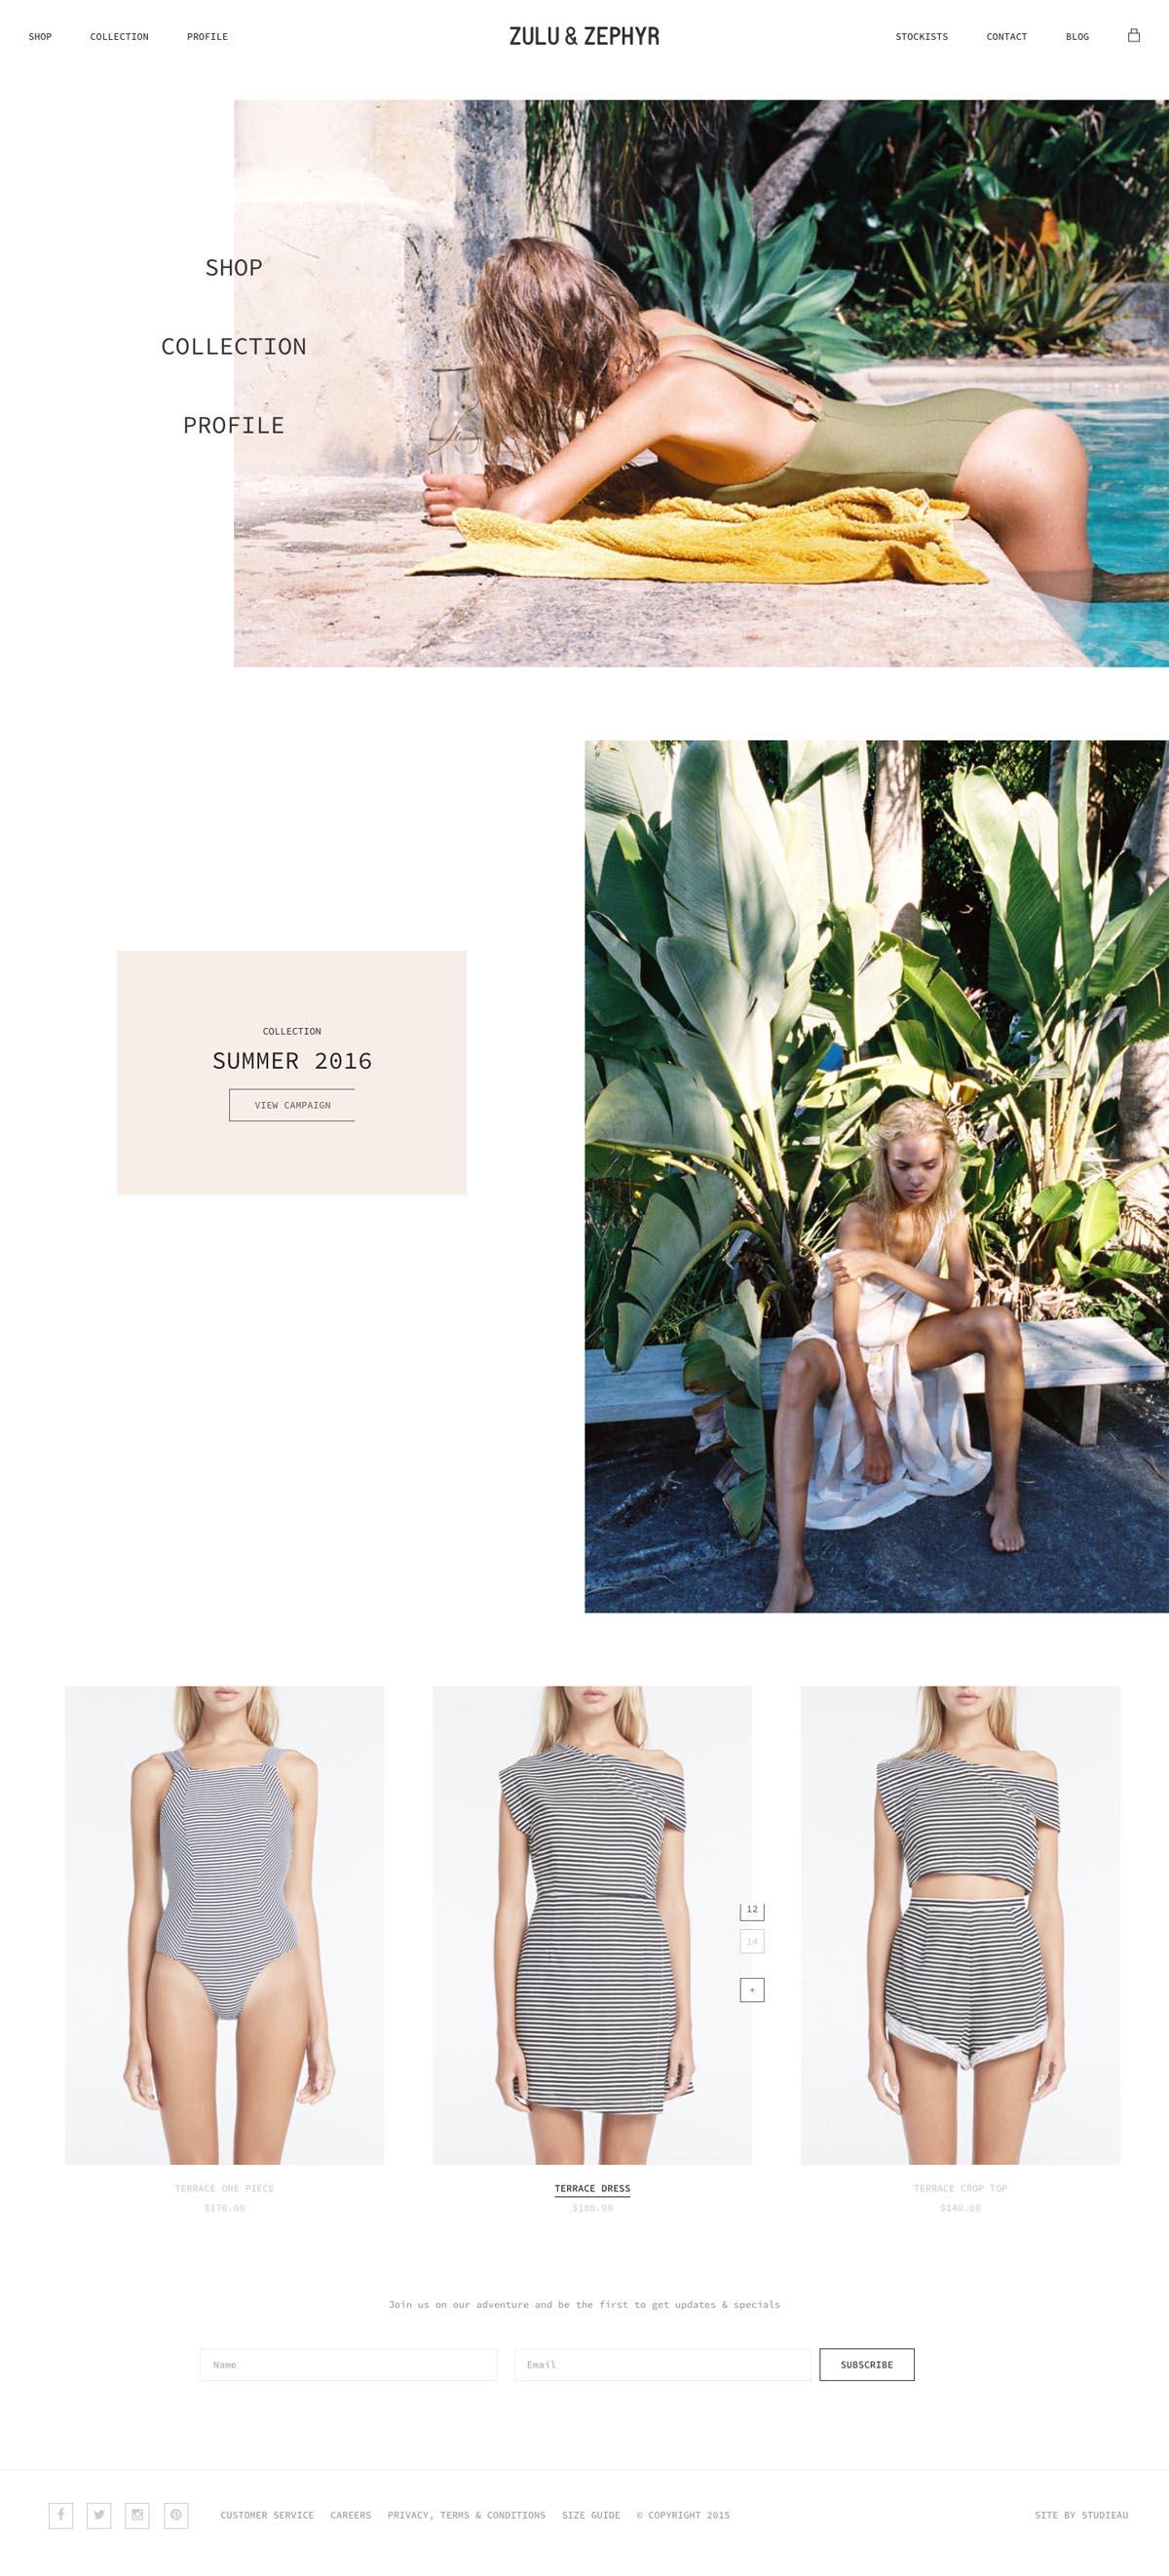 eCommerce website: Zulu & Zephyr